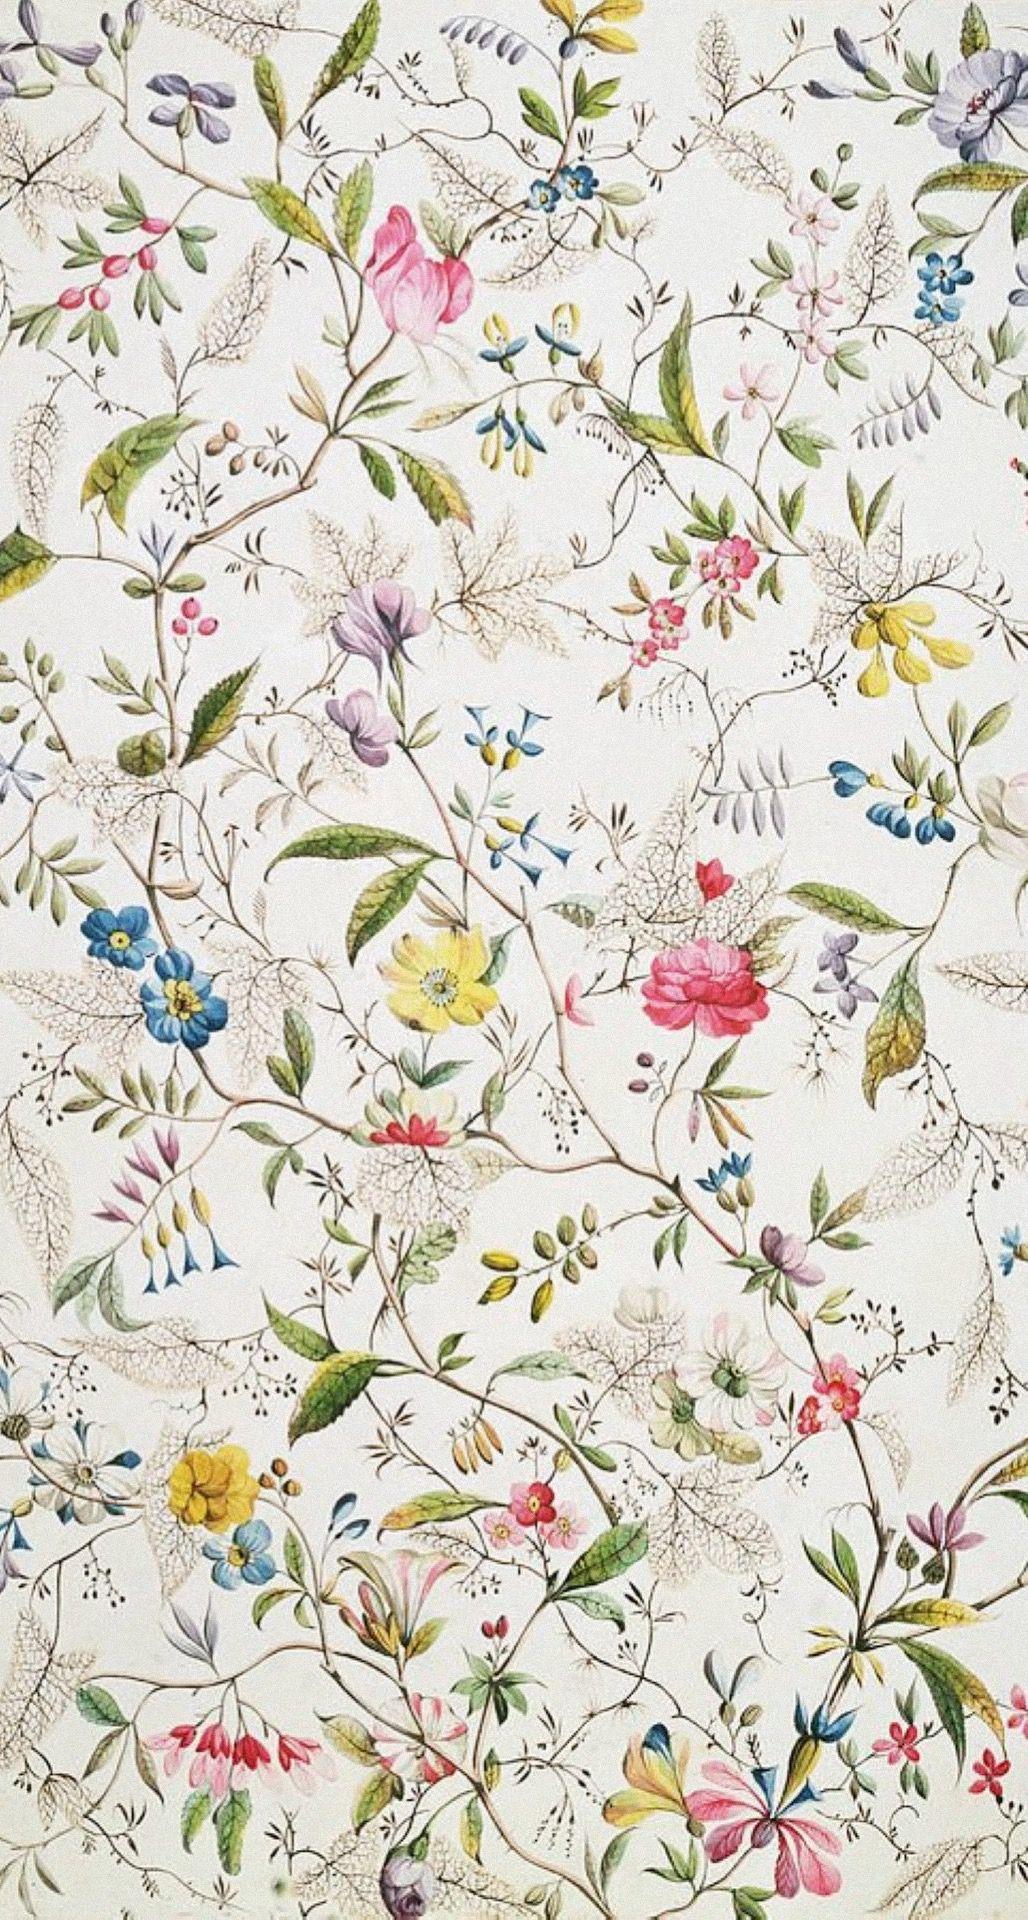 Wallpaper Hallway Larobotique William Kilburn Wild Flowers Design For Silk Material 1790